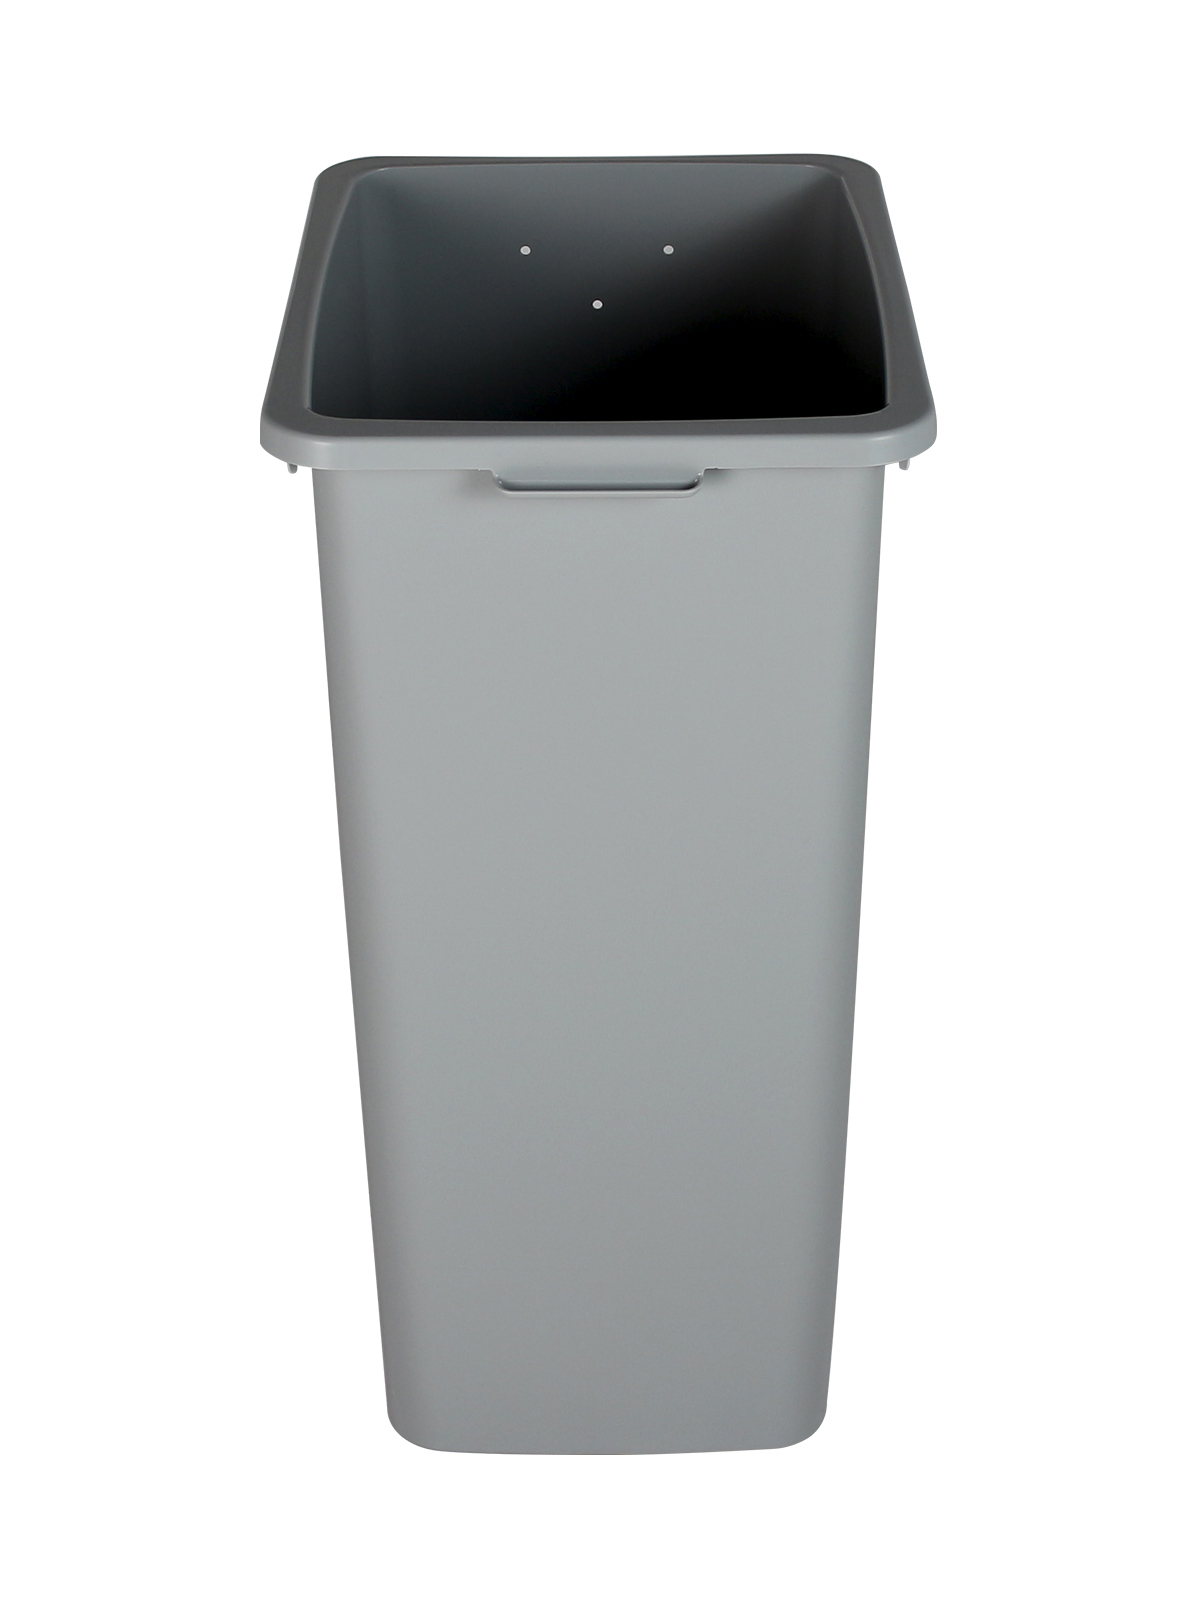 WASTE WATCHER XL - Single - Body - 30 - Executive Grey